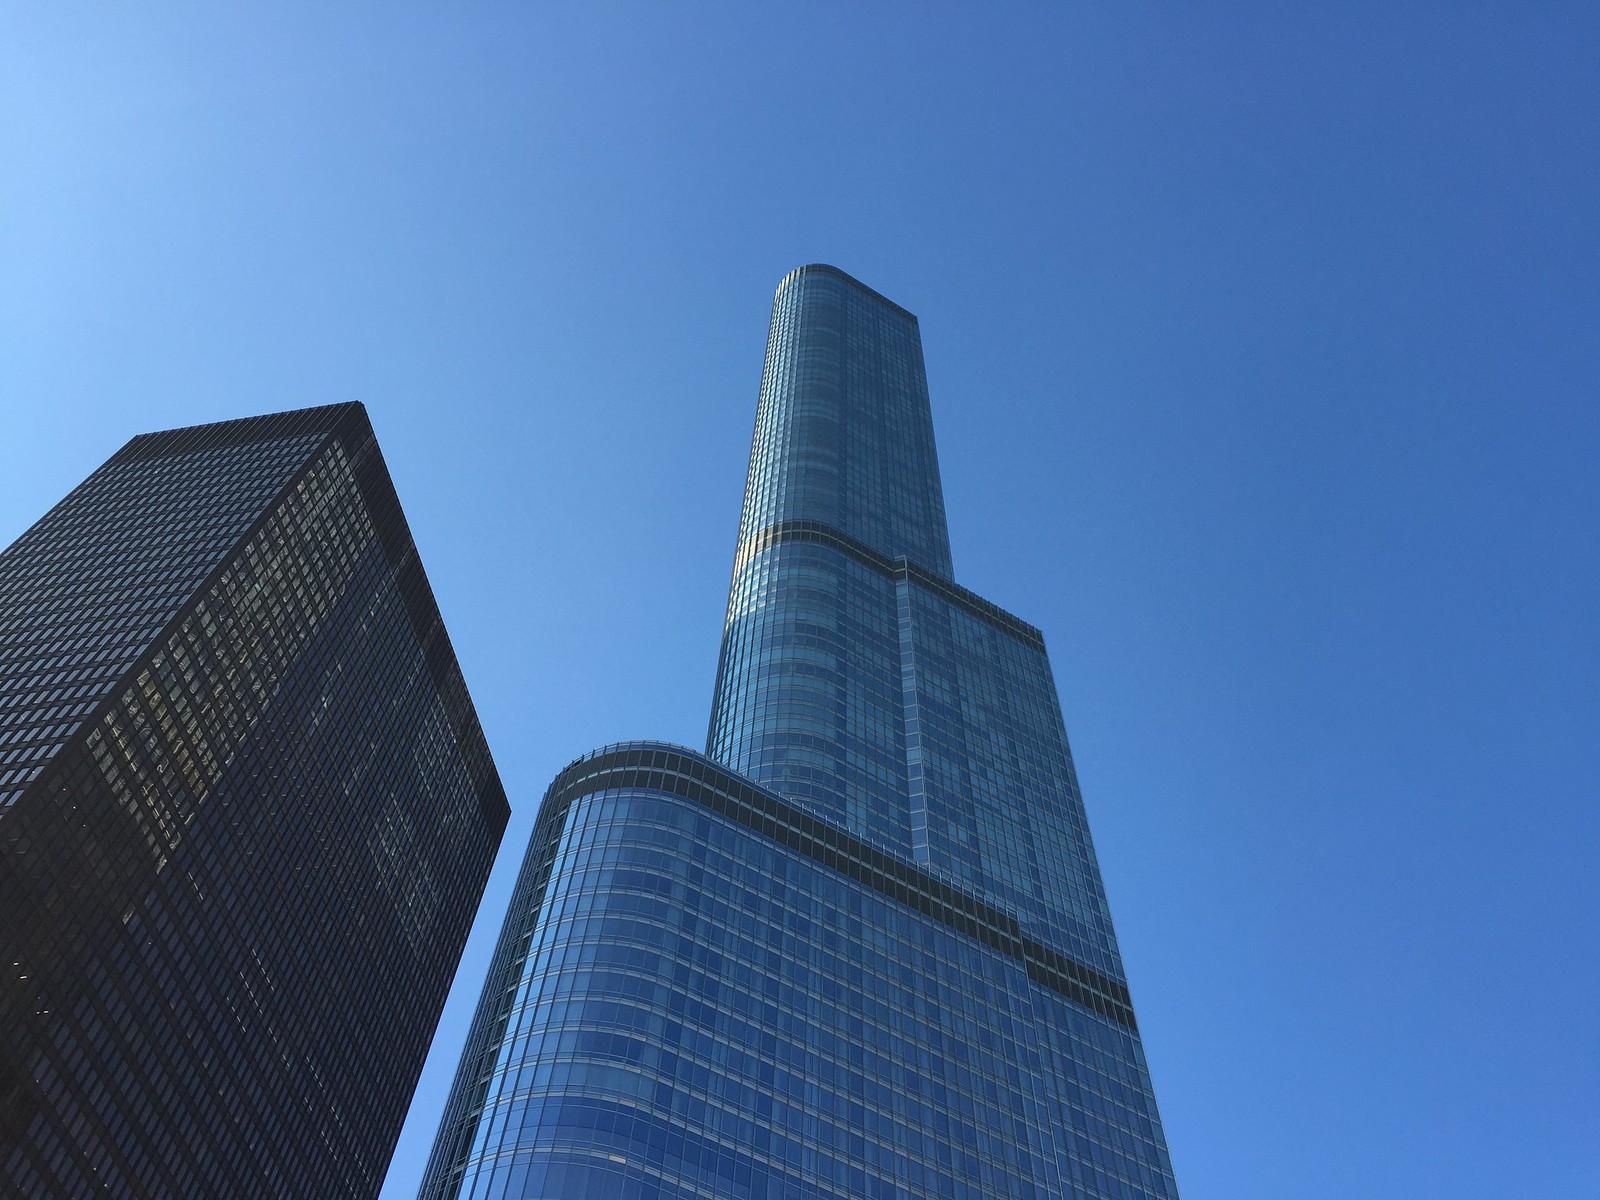 Chicago 21-04-2015 17-10-11